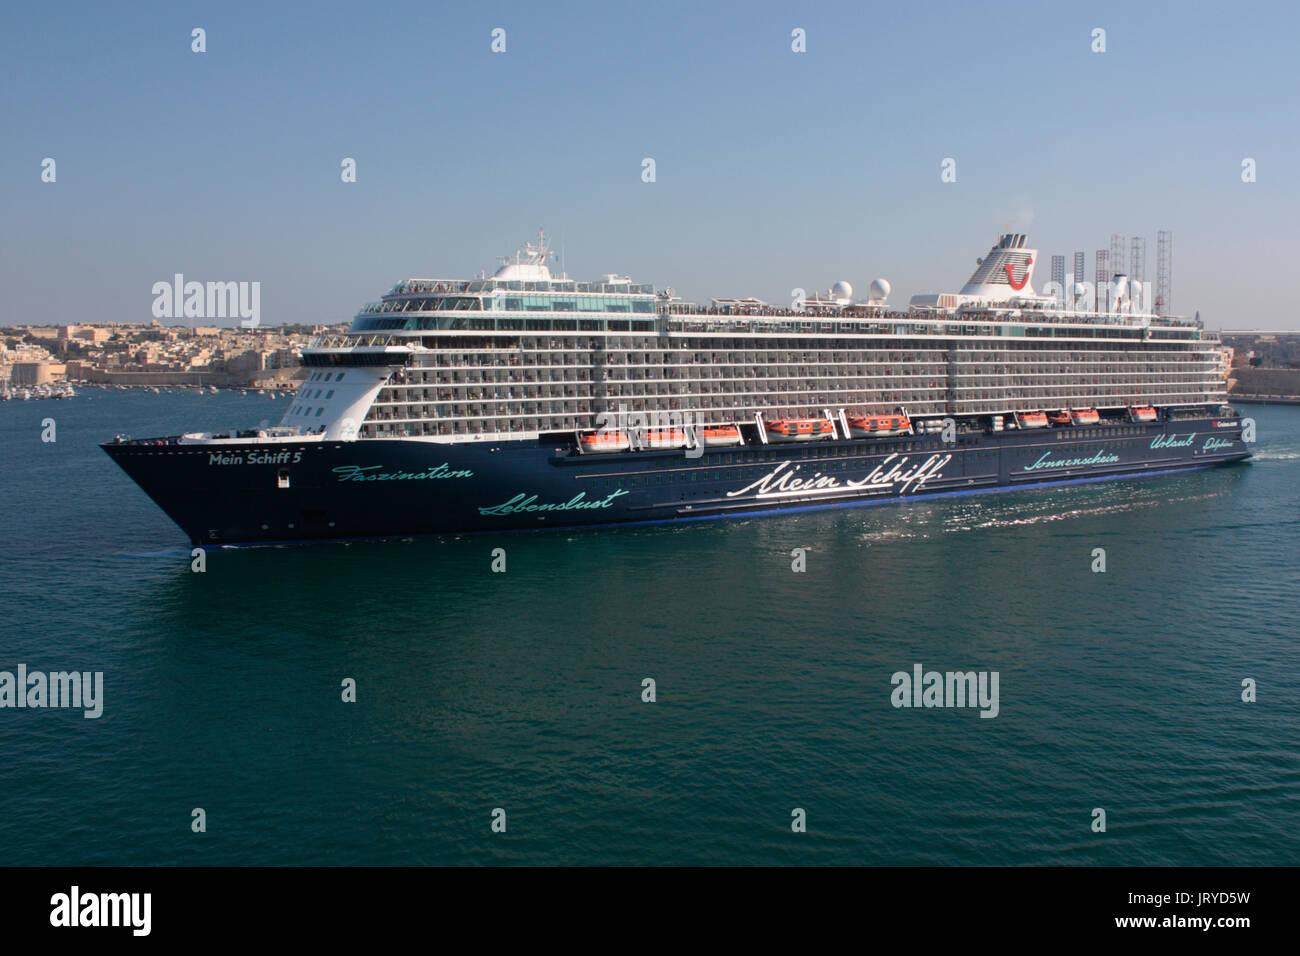 Mediterranean travel. The TUI Cruises cruise ship Mein Schiff 5 departing from Malta's Grand Harbour - Stock Image